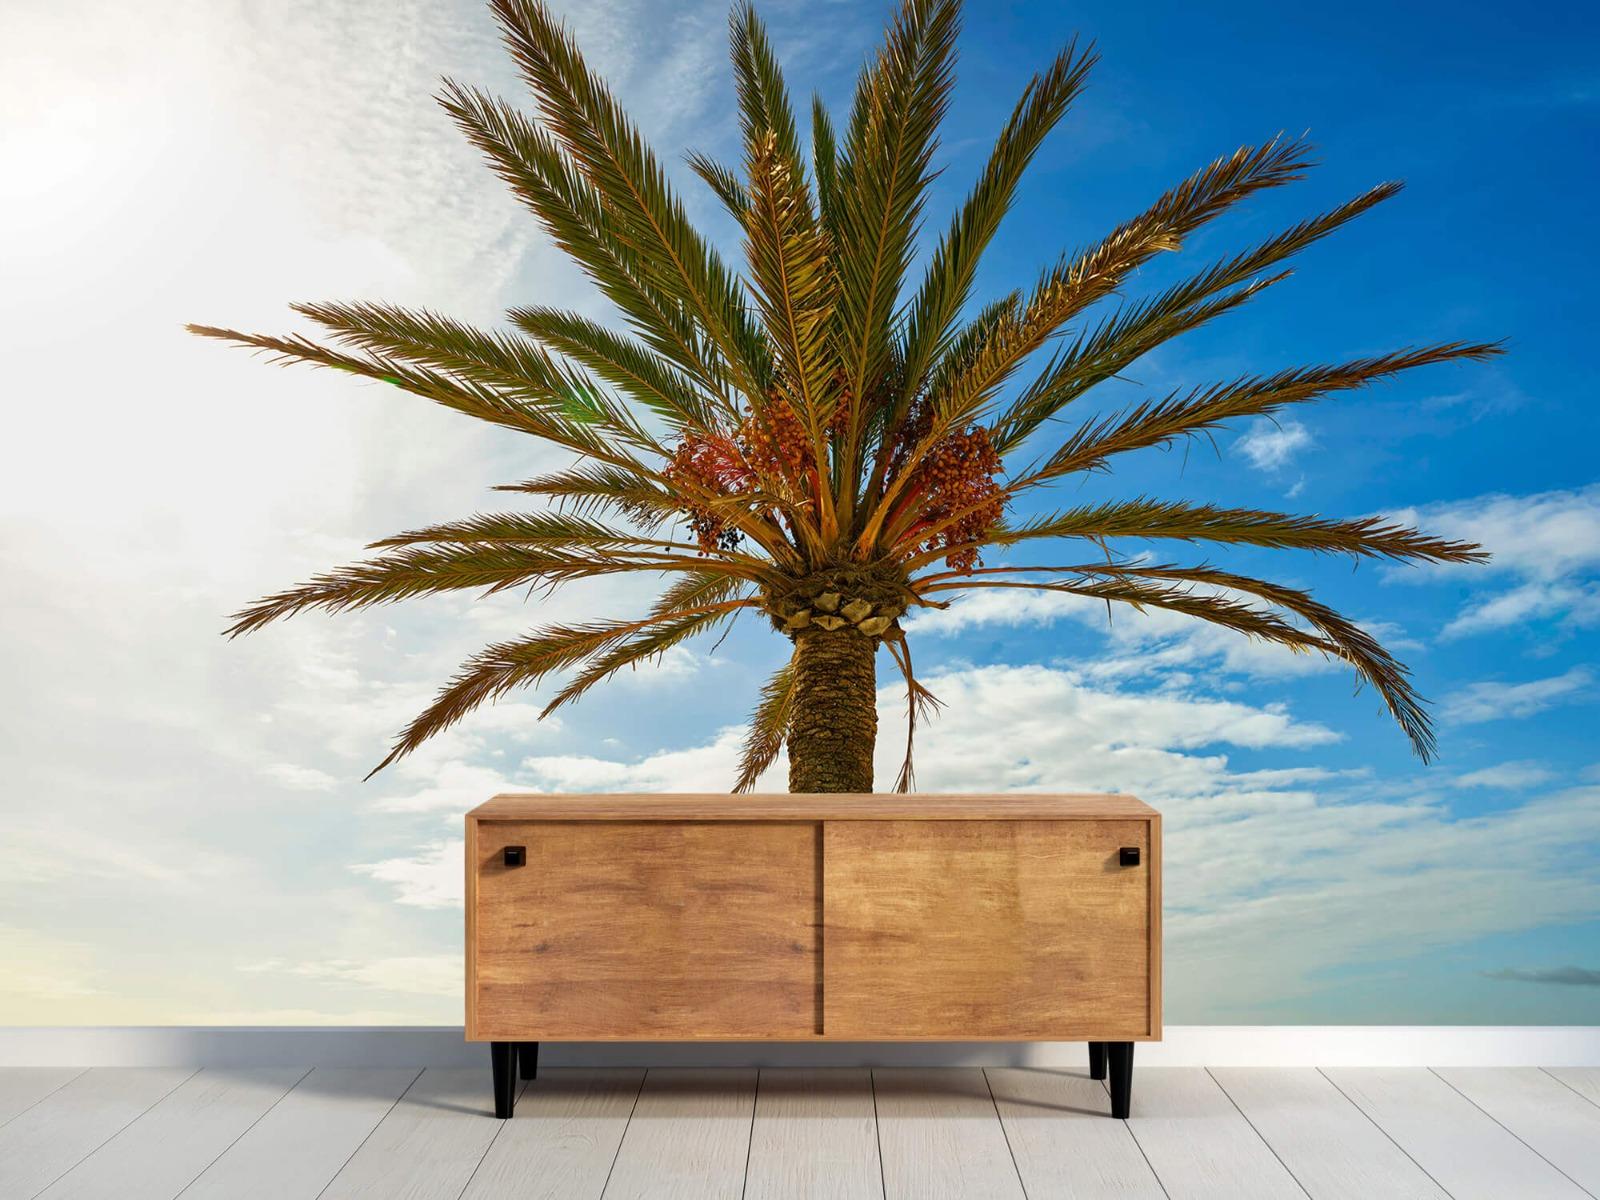 Palmbomen - Mooie palmboom - Keuken 9